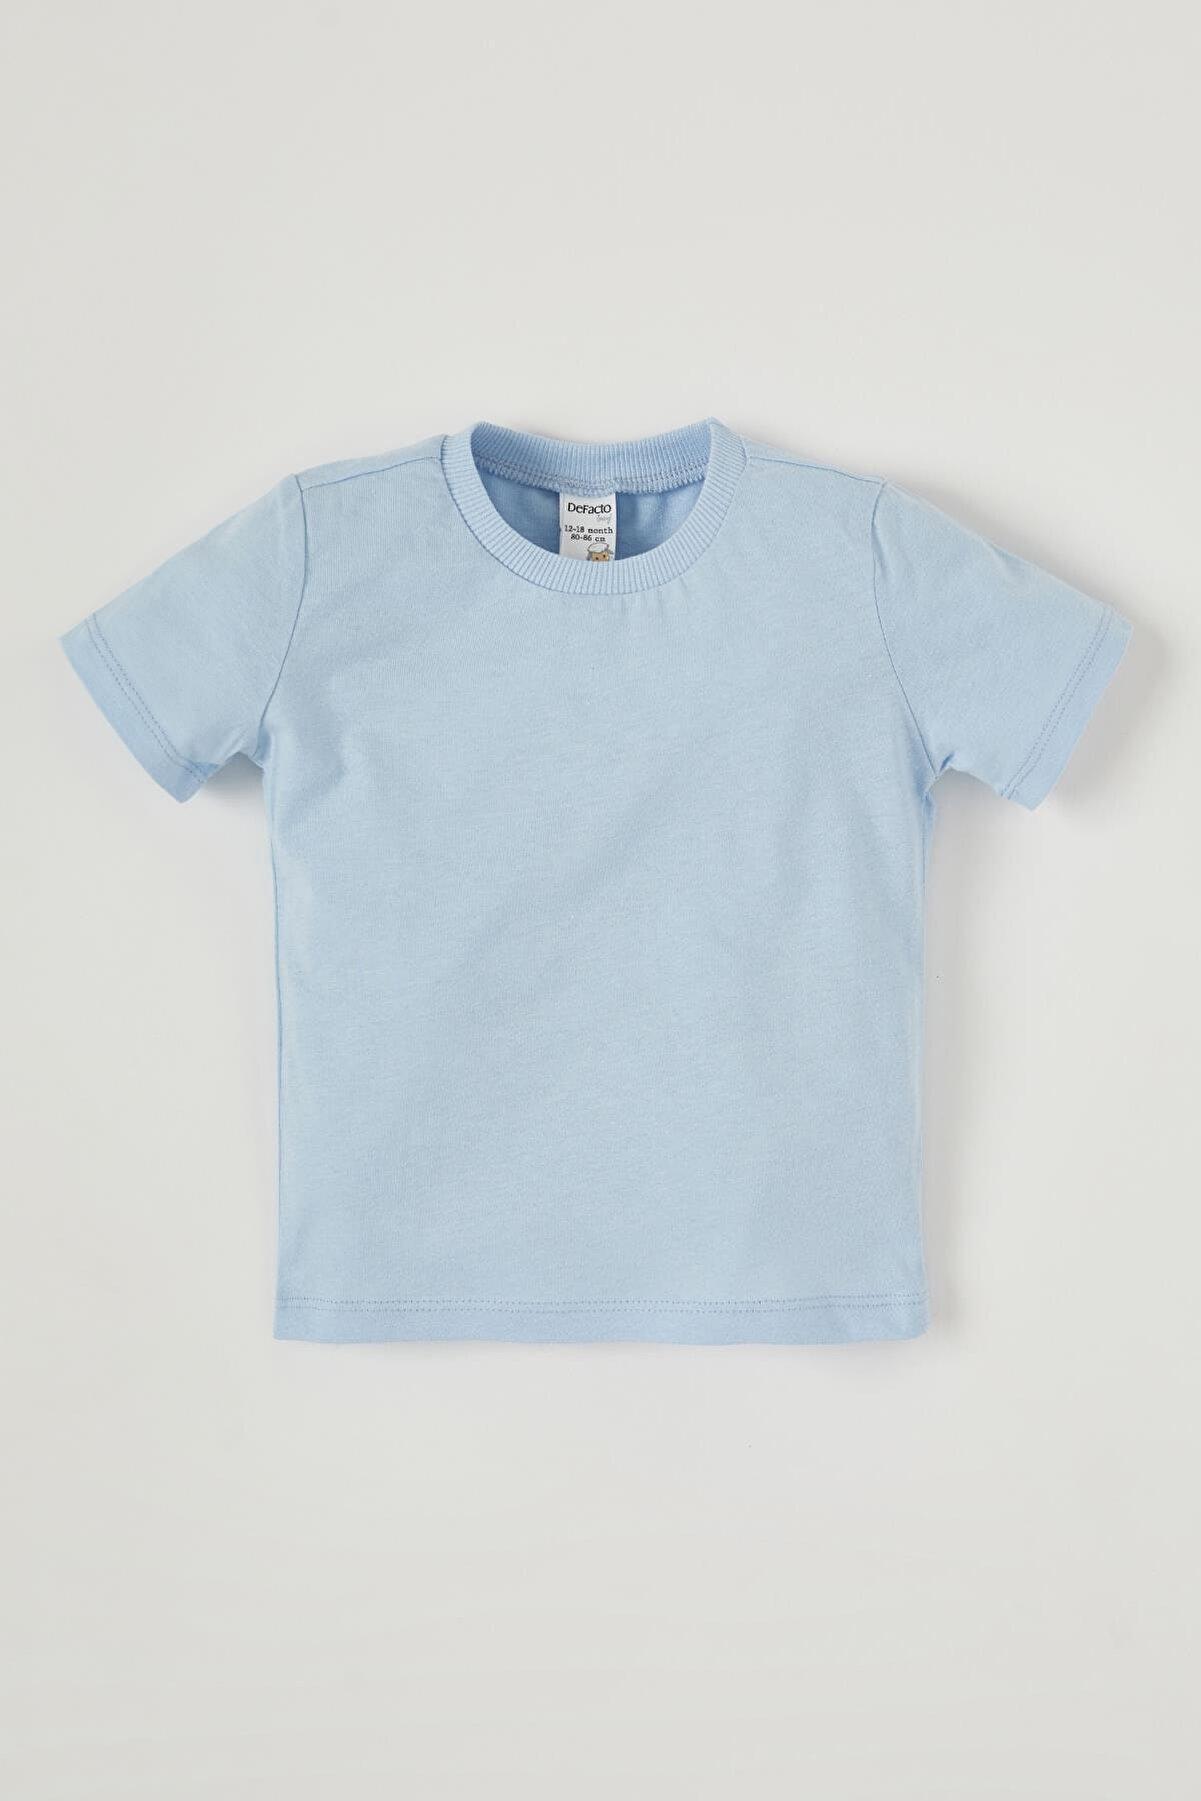 Defacto Unisex Bebek Basic Pamuklu Kısa Kollu Tişört